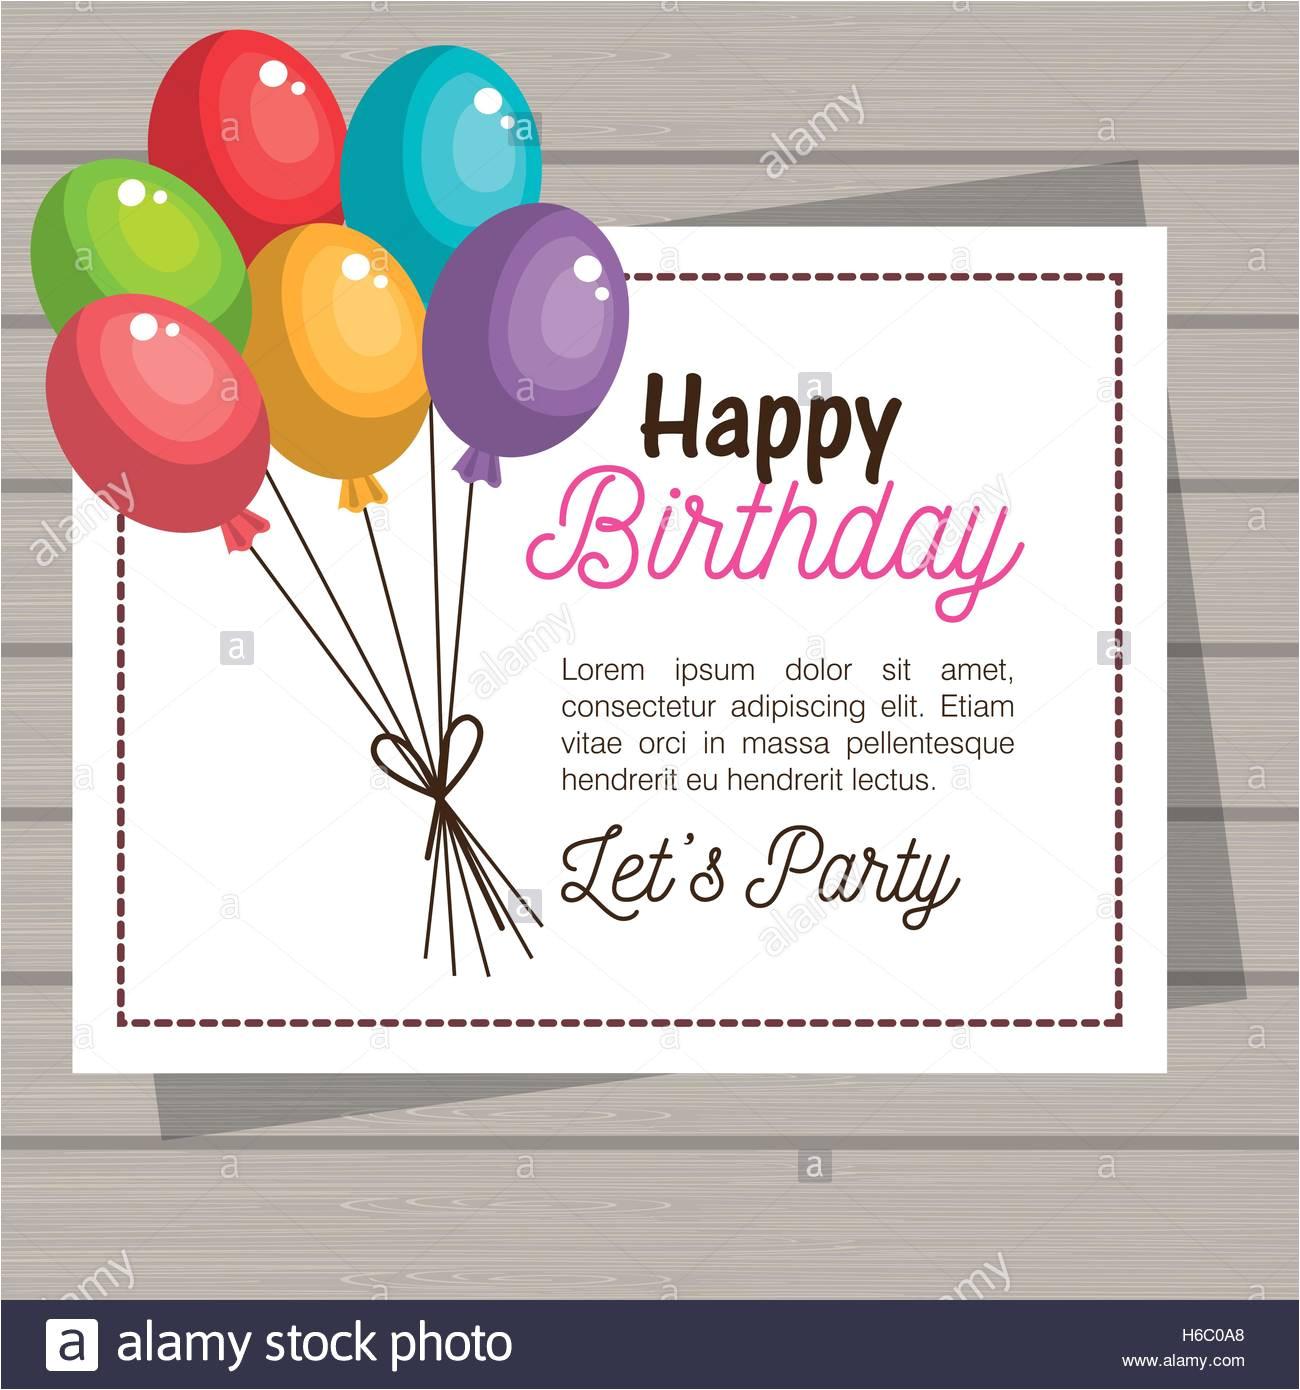 Happy Birthday Invitation Card Images Happy Birthday Invitation Card Stock Vector Art